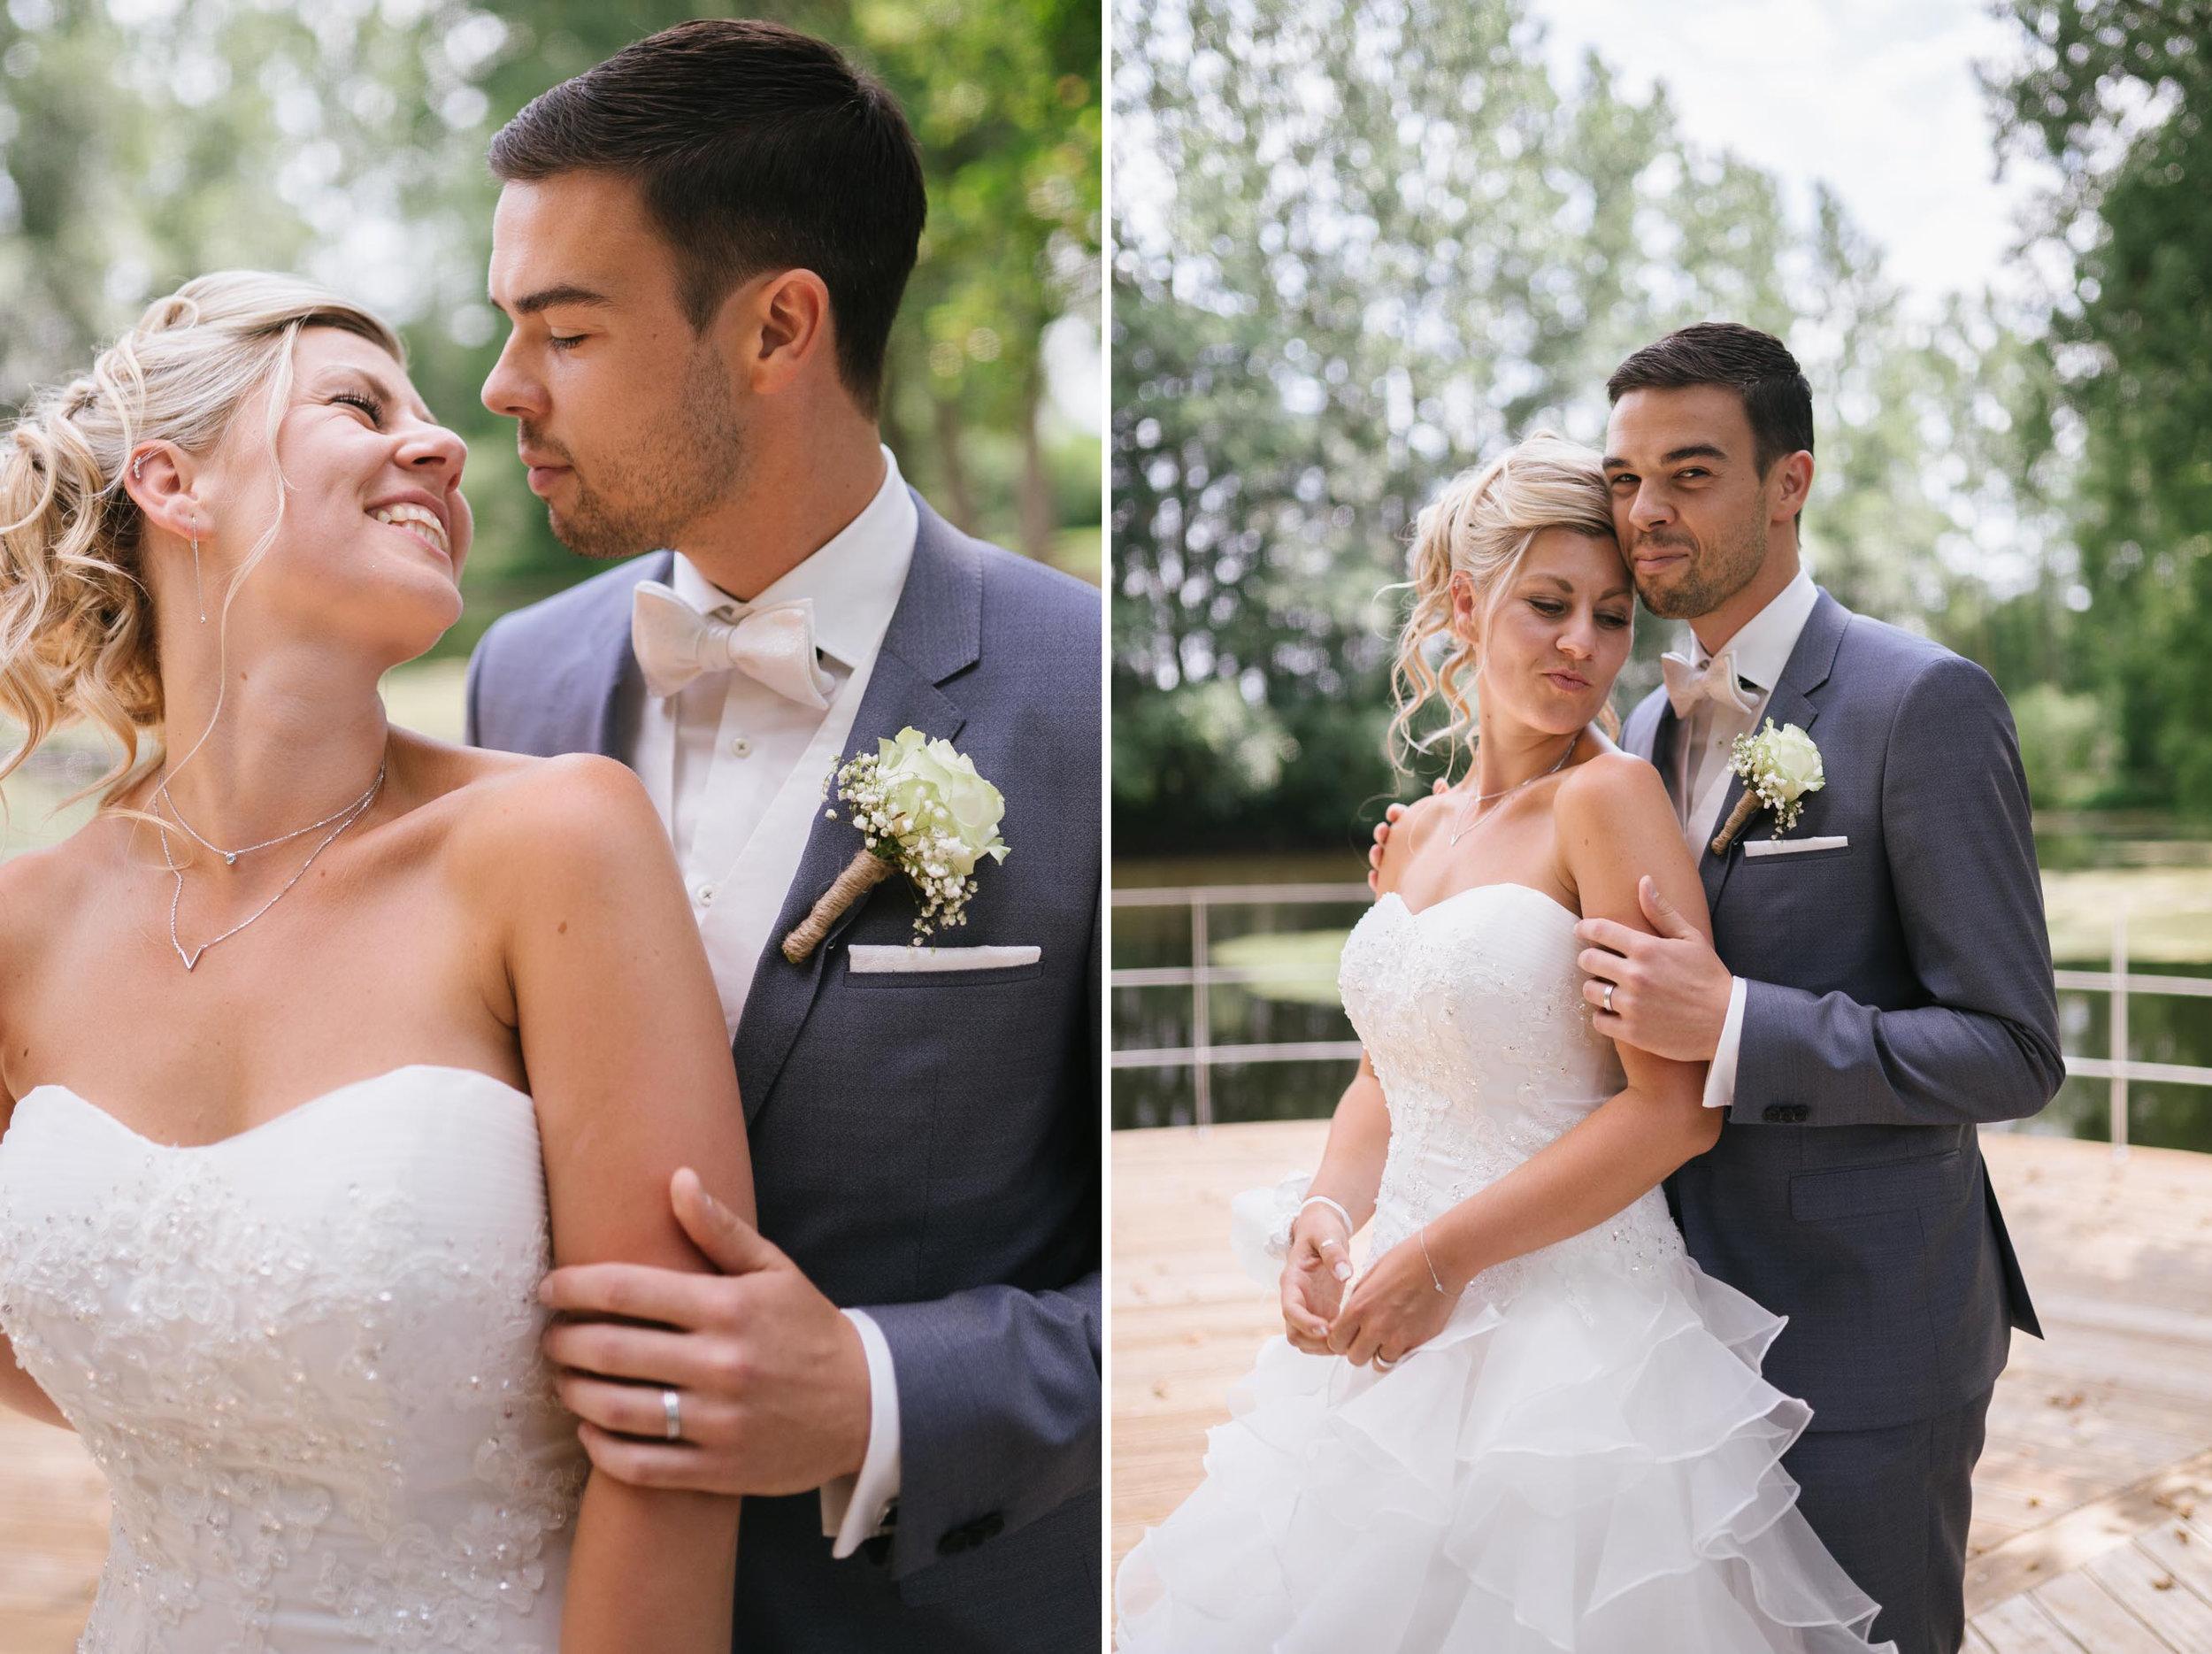 photographe-videaste-mariage-bruxelles2.jpg